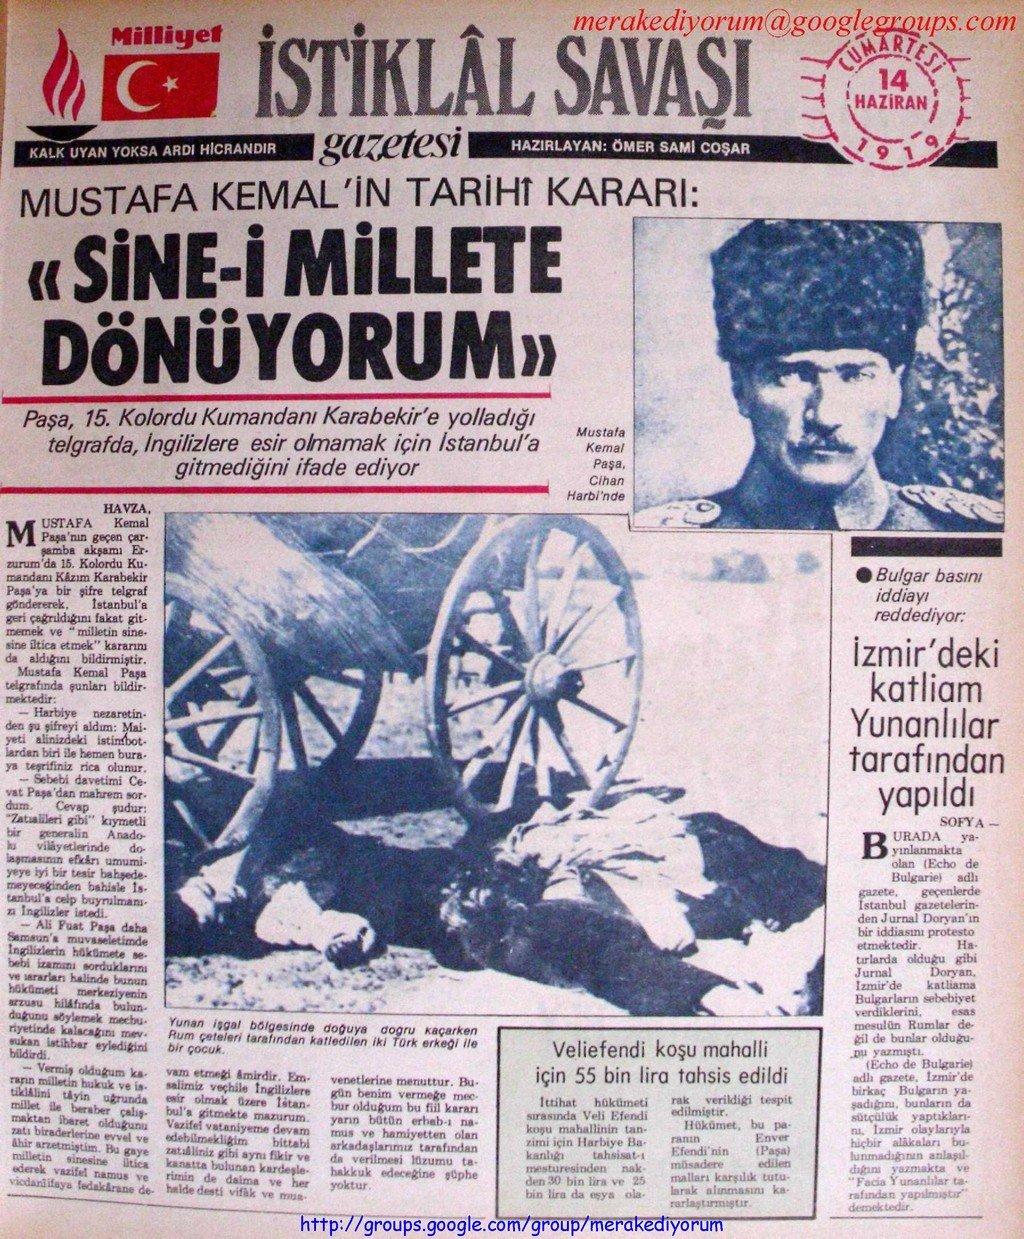 istiklal savaşı gazetesi - 14 haziran 1919